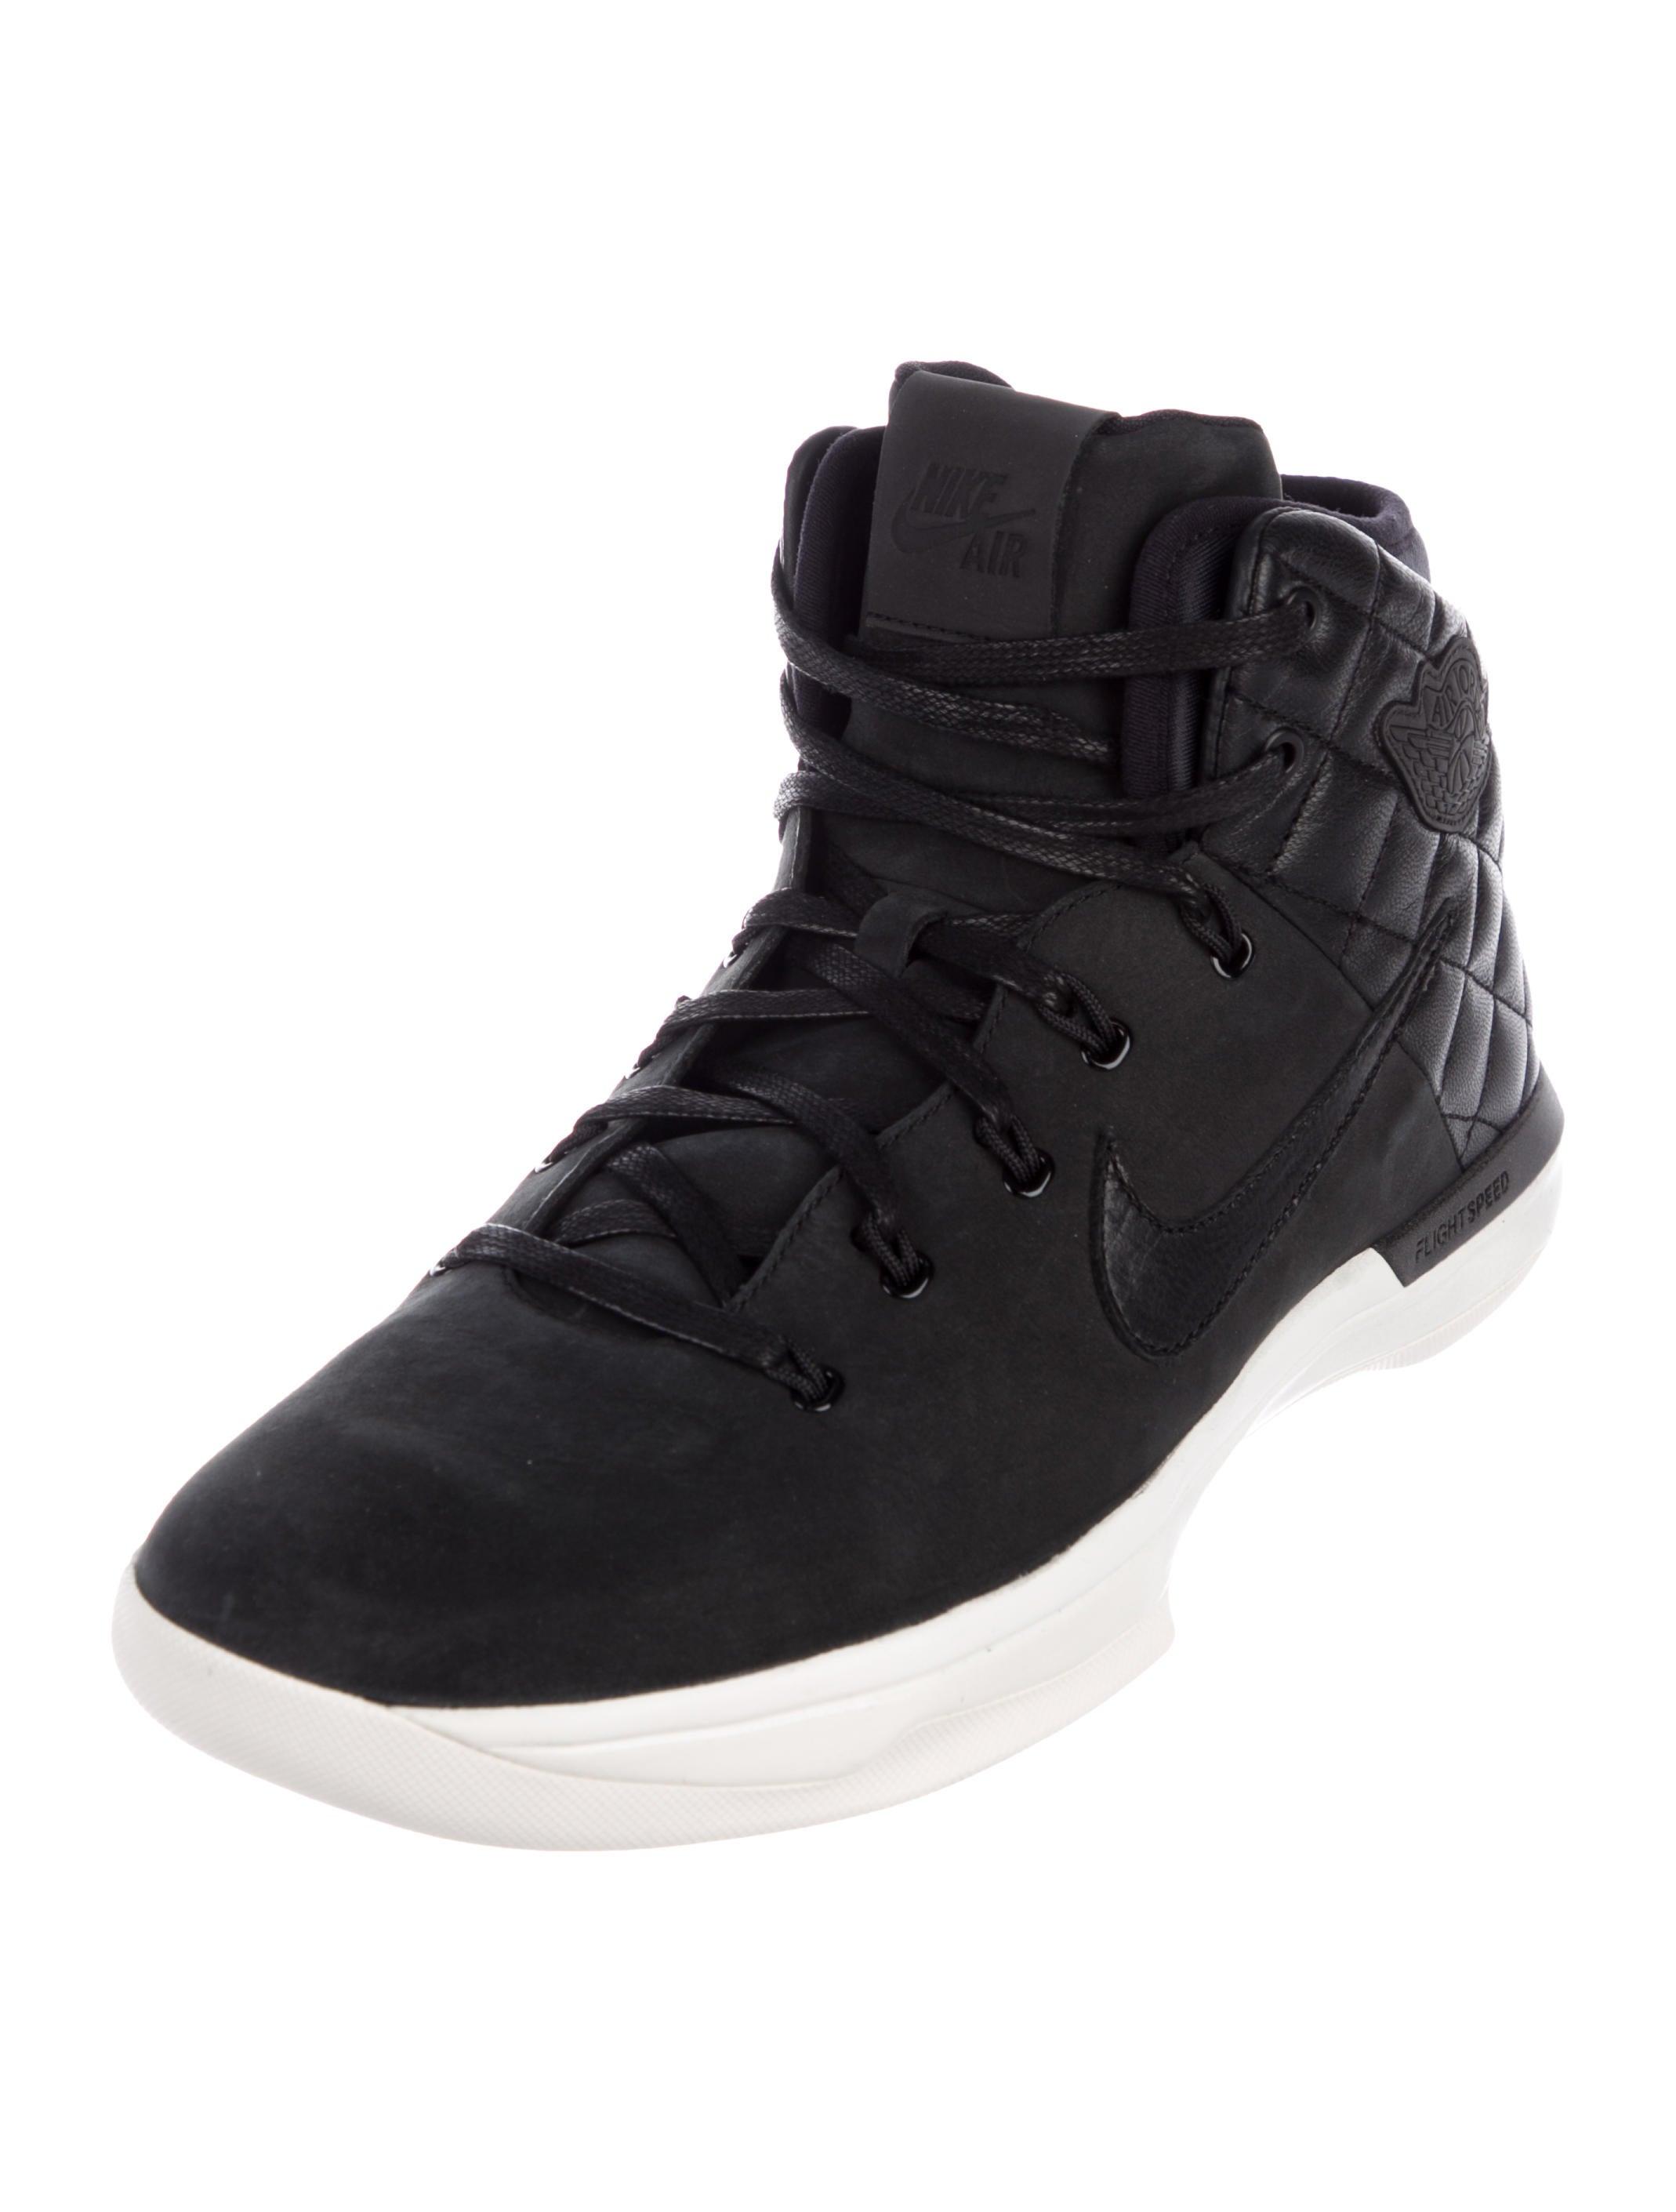 meet d37c8 21b63 Nike Air Jordan 2016 XXXI Cyber Monday Black Cat Sample ...